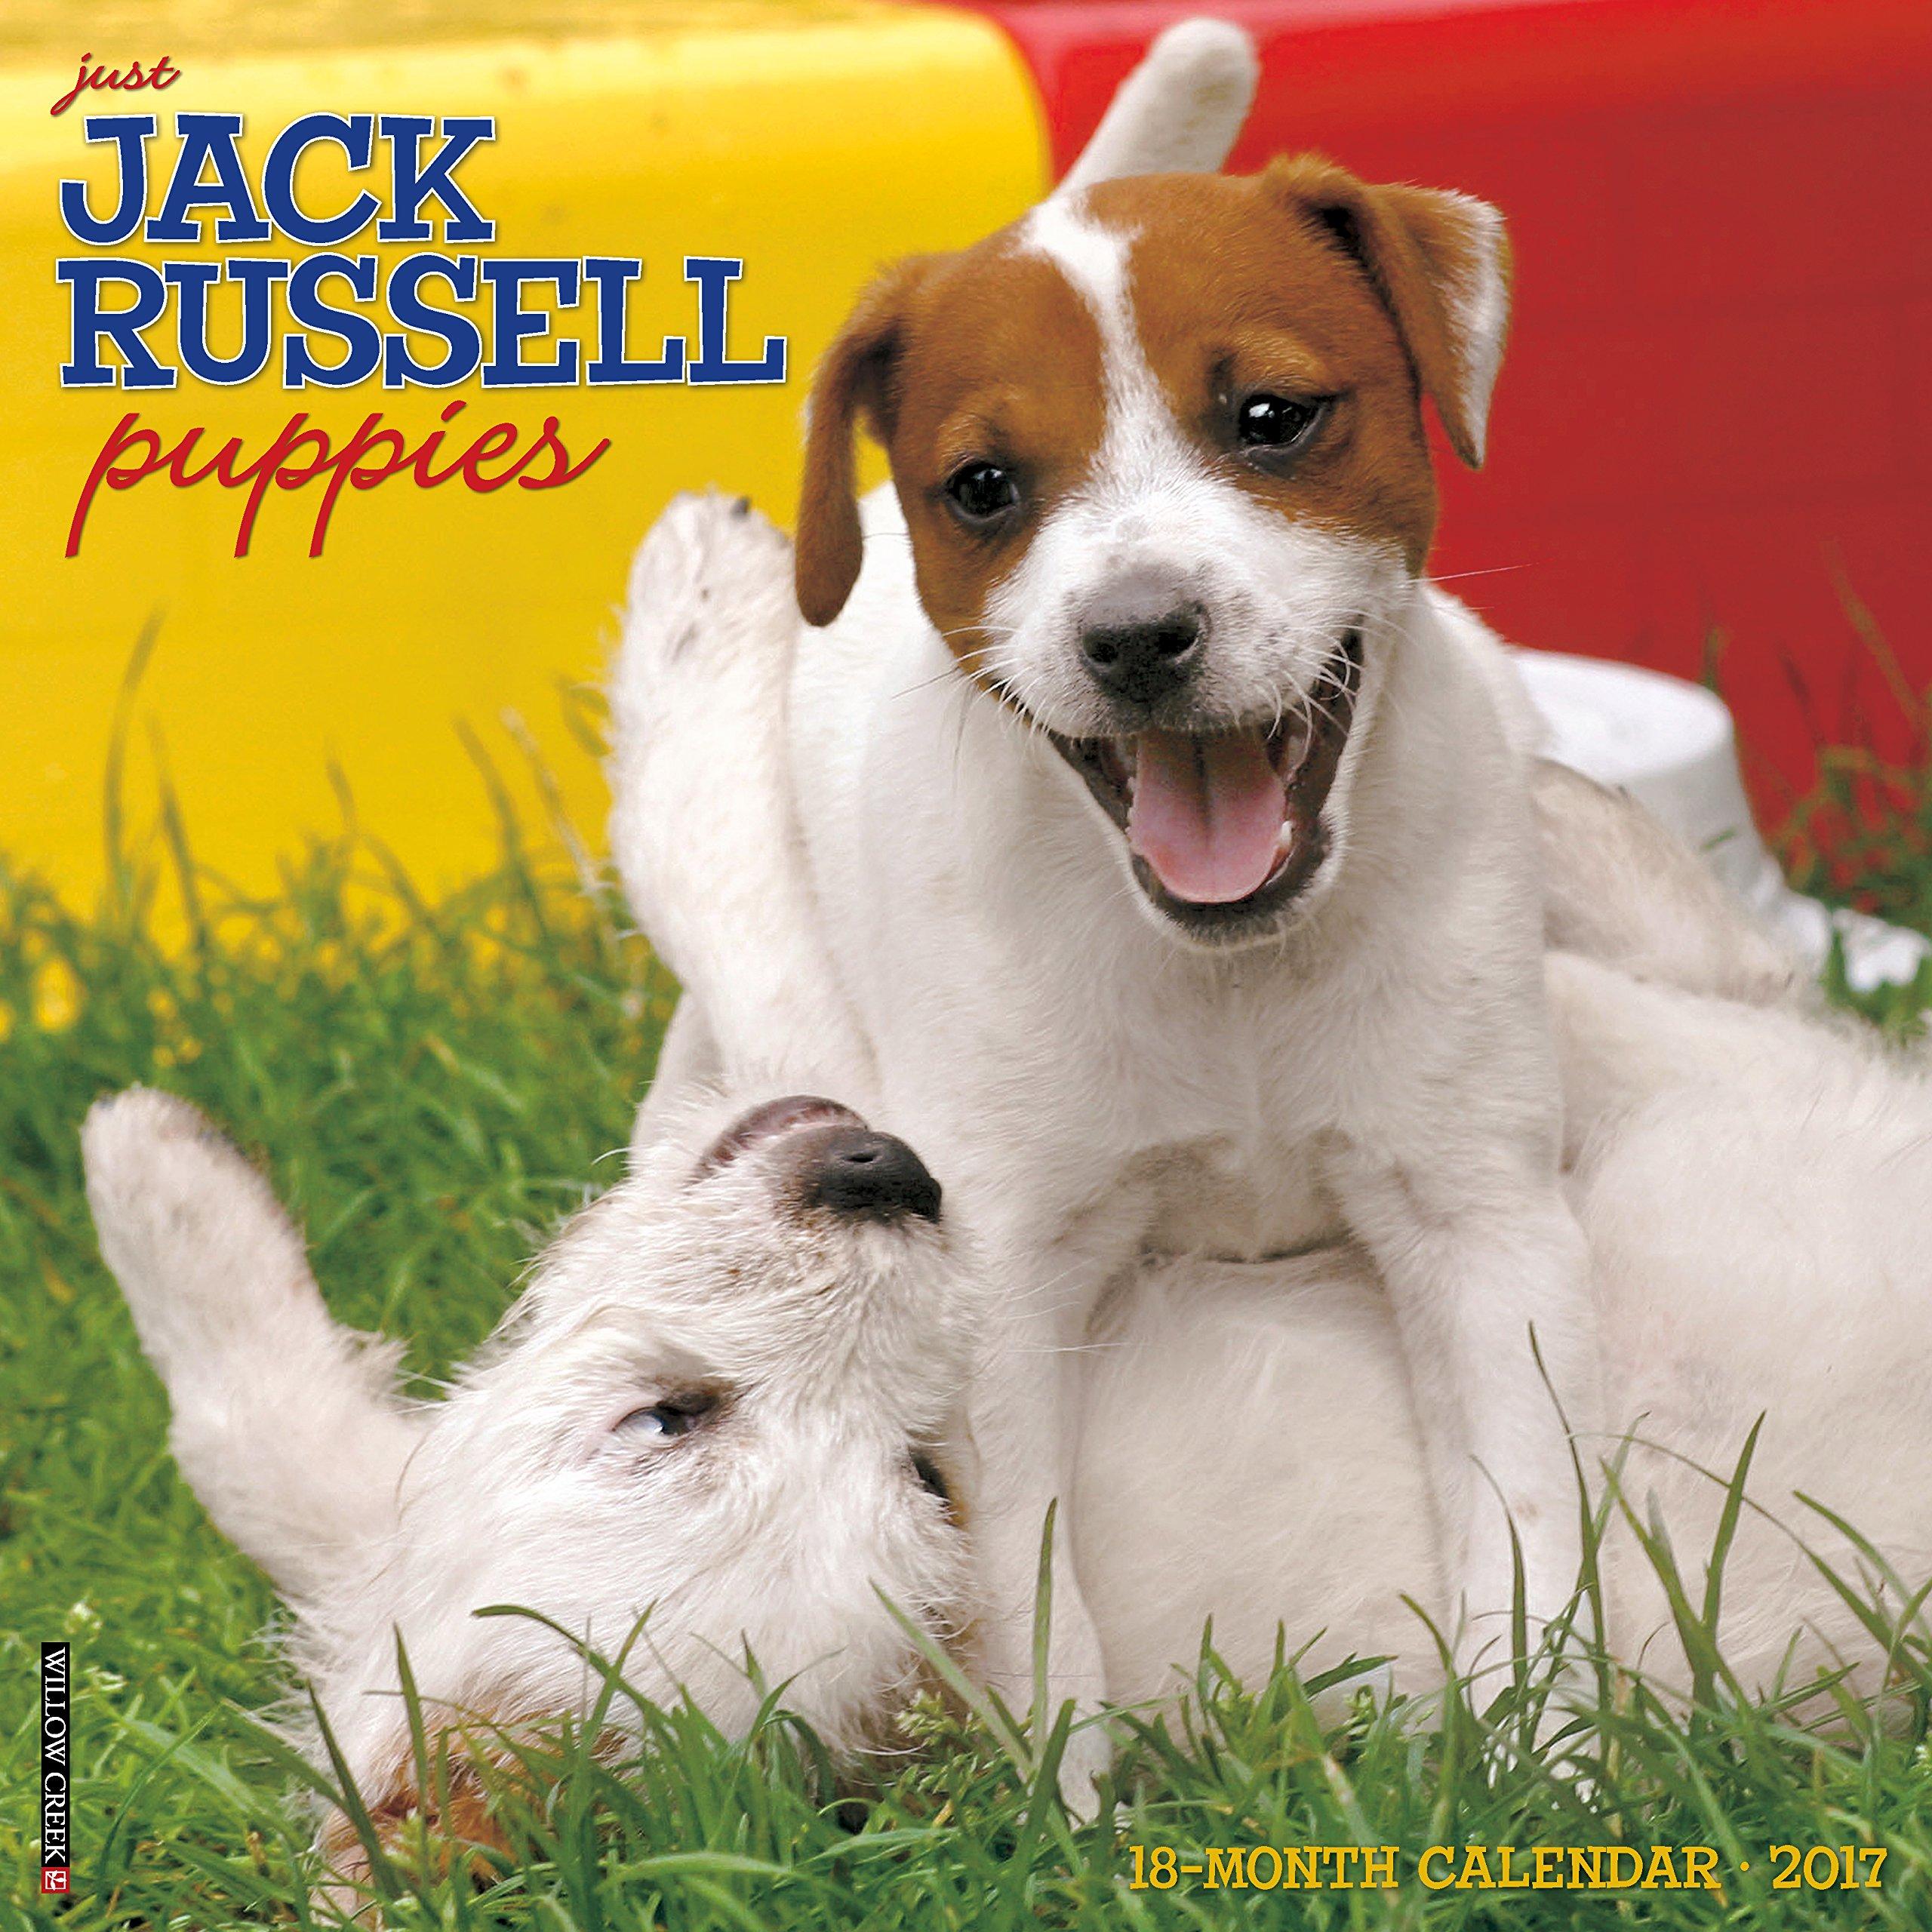 Just Jack Russell Puppies 2017 Wall Calendar (Dog Breed Calendars) pdf